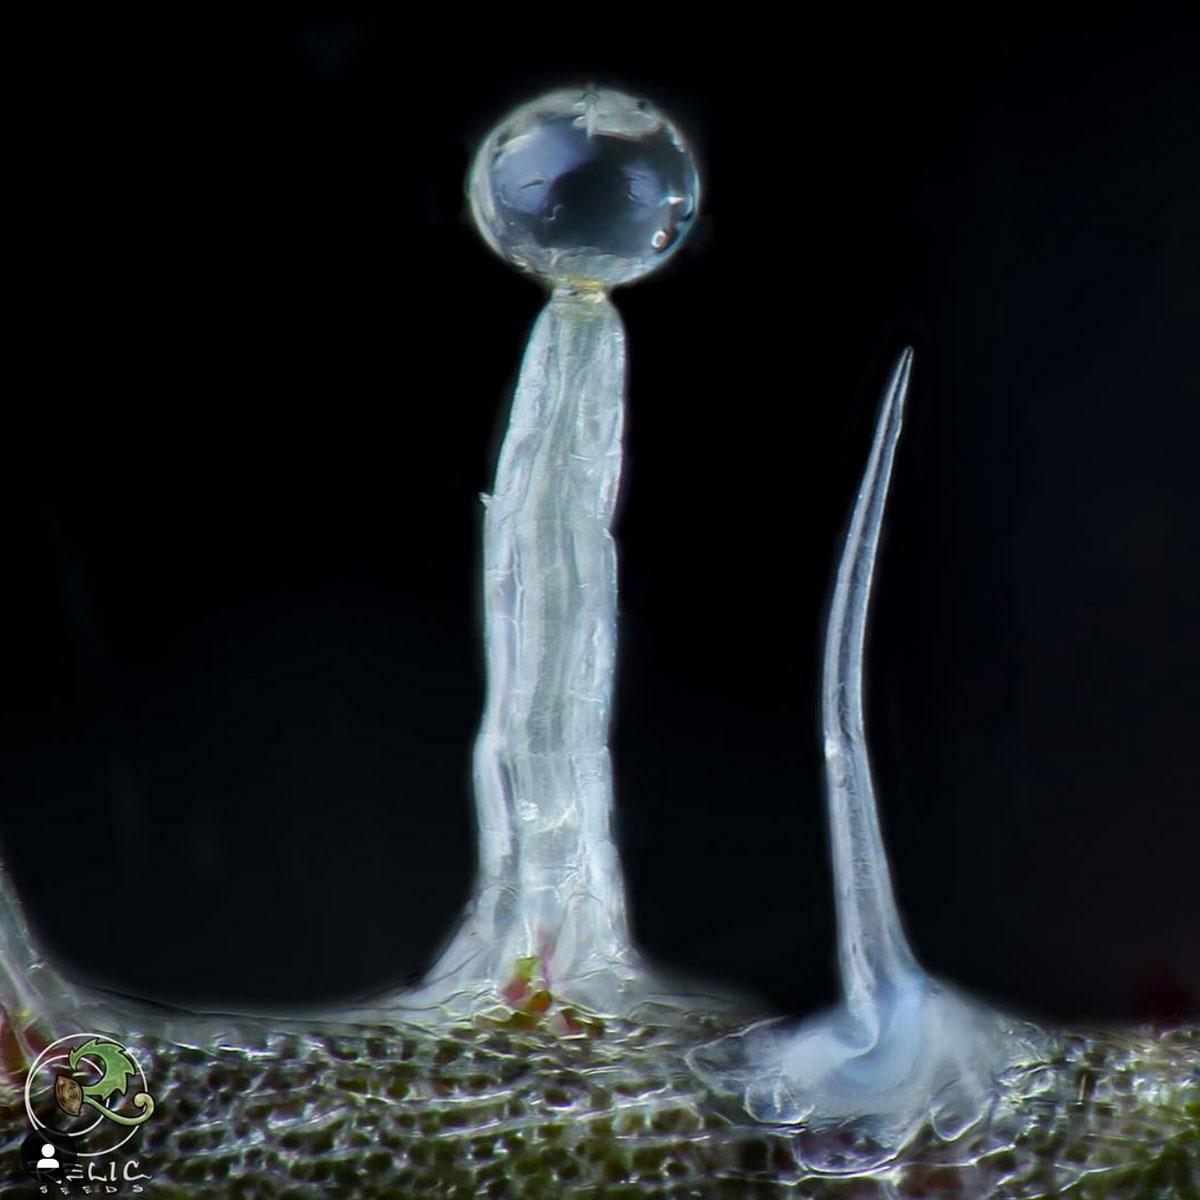 Left: Stalked Capitate Glandular Trichome. Photo by Professor P.  Dyntasty Genetics .